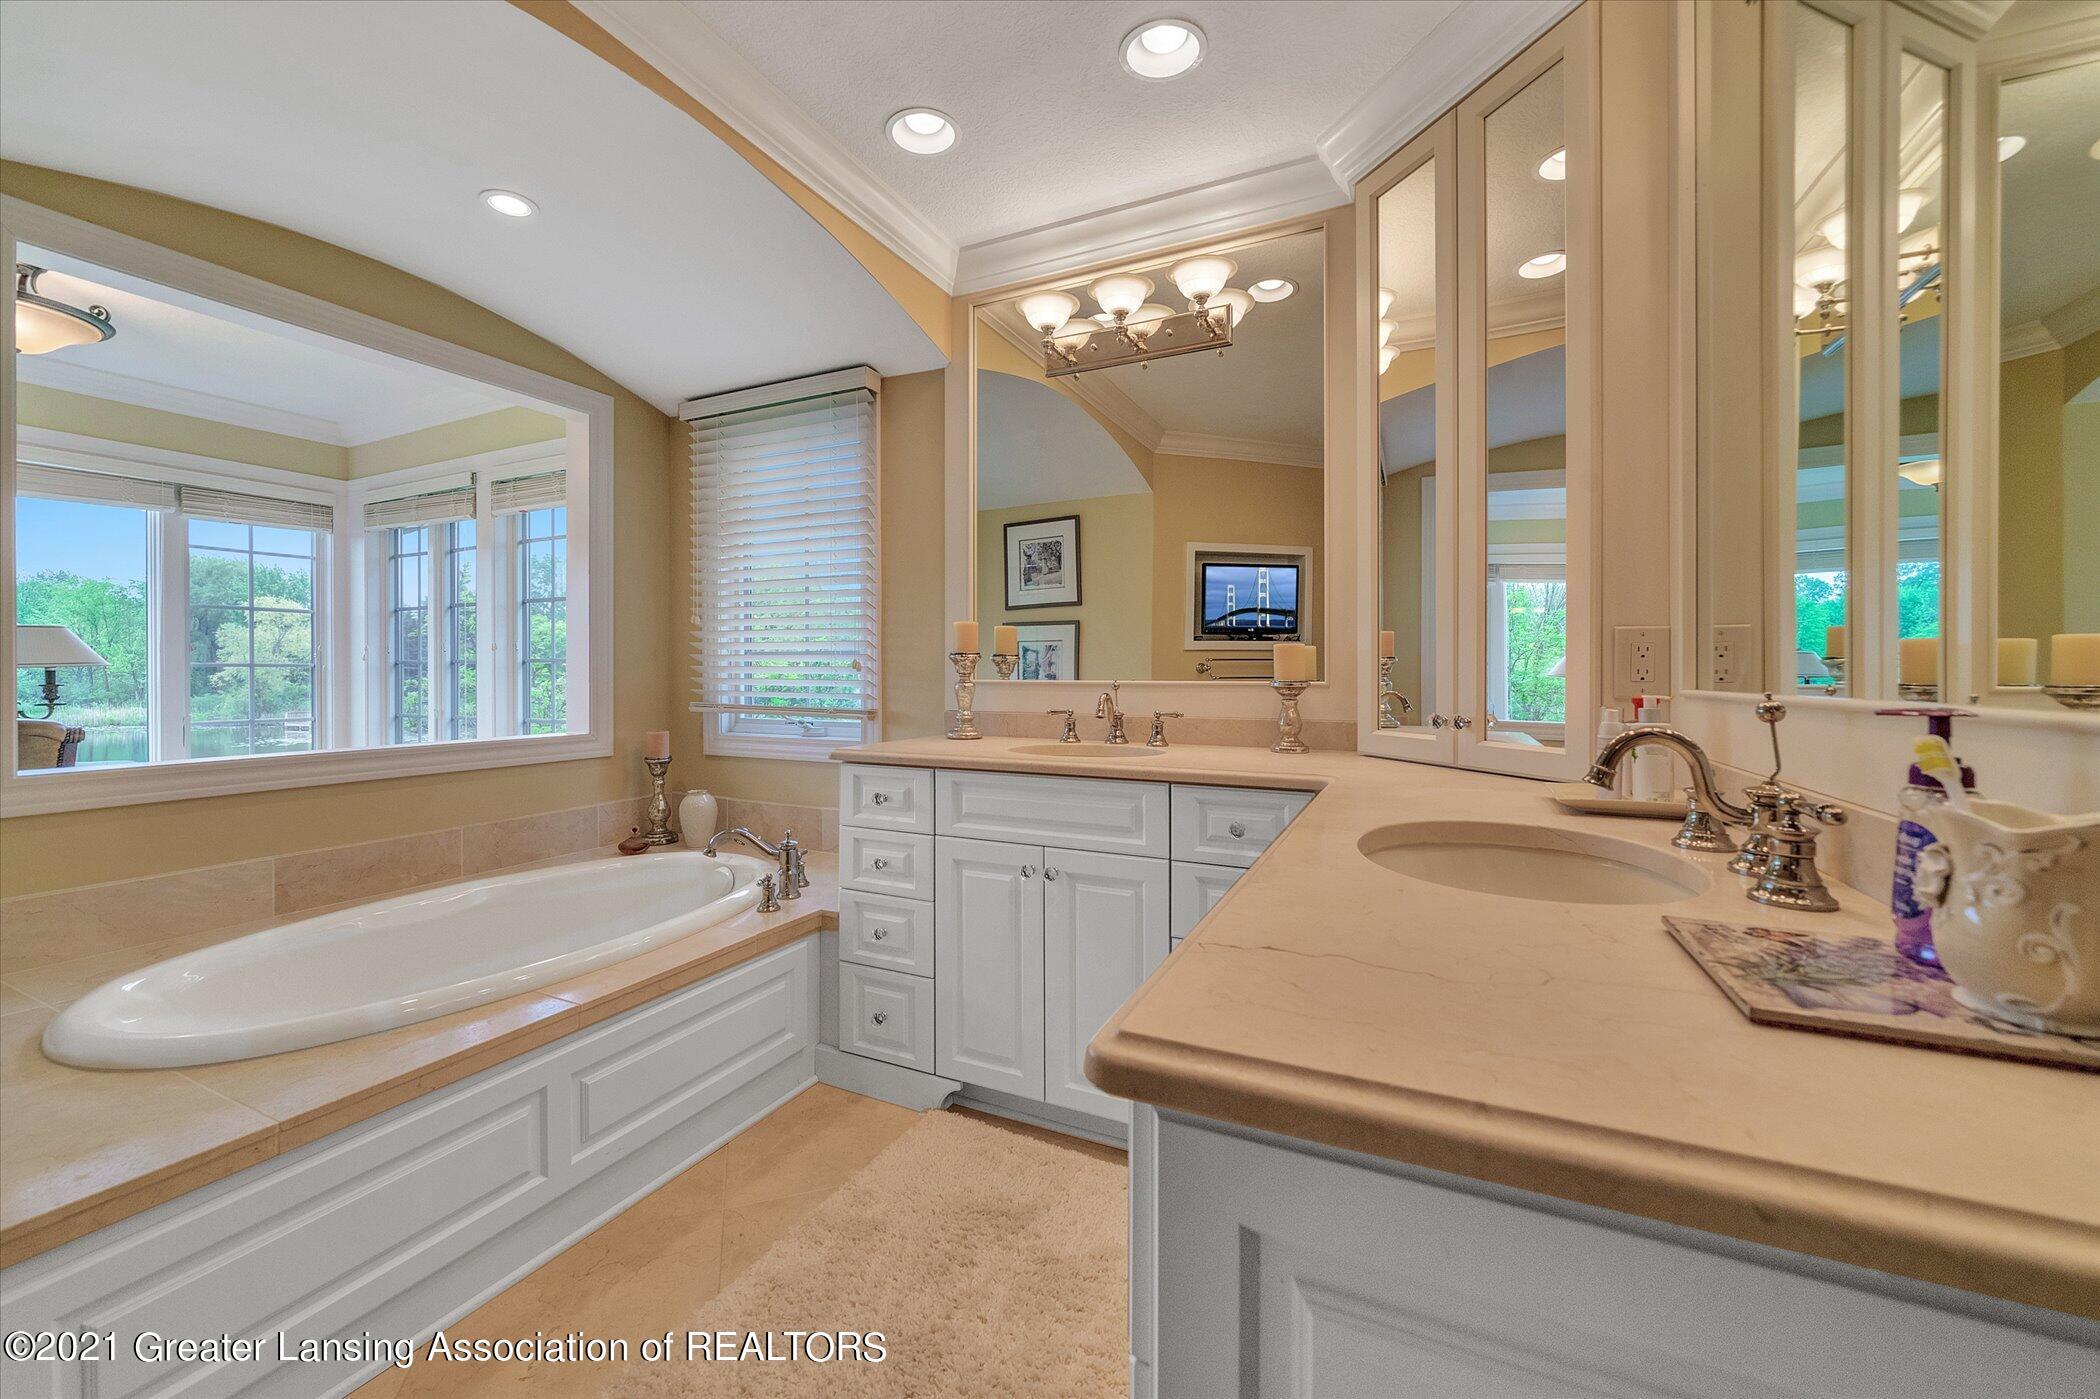 6330 Pine Hollow Dr - MAIN FLOOR Primary Bathroom - 29